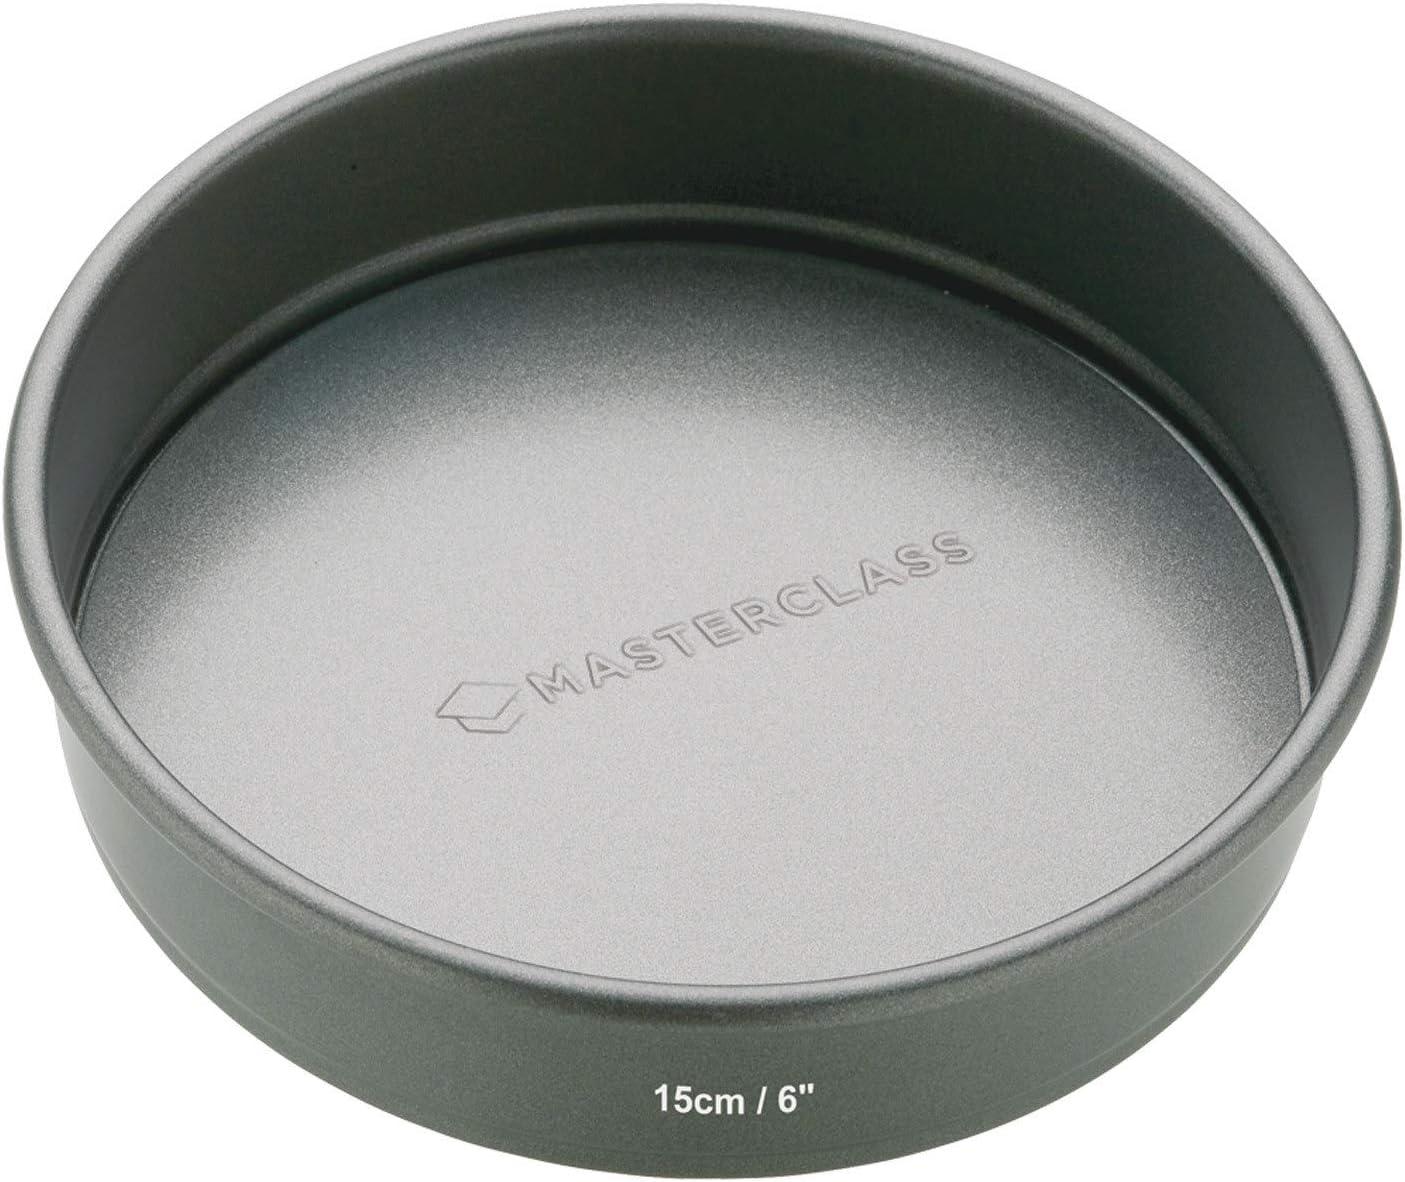 1 Kitchencraft Masterclass Backform 15cm mit losem Boden